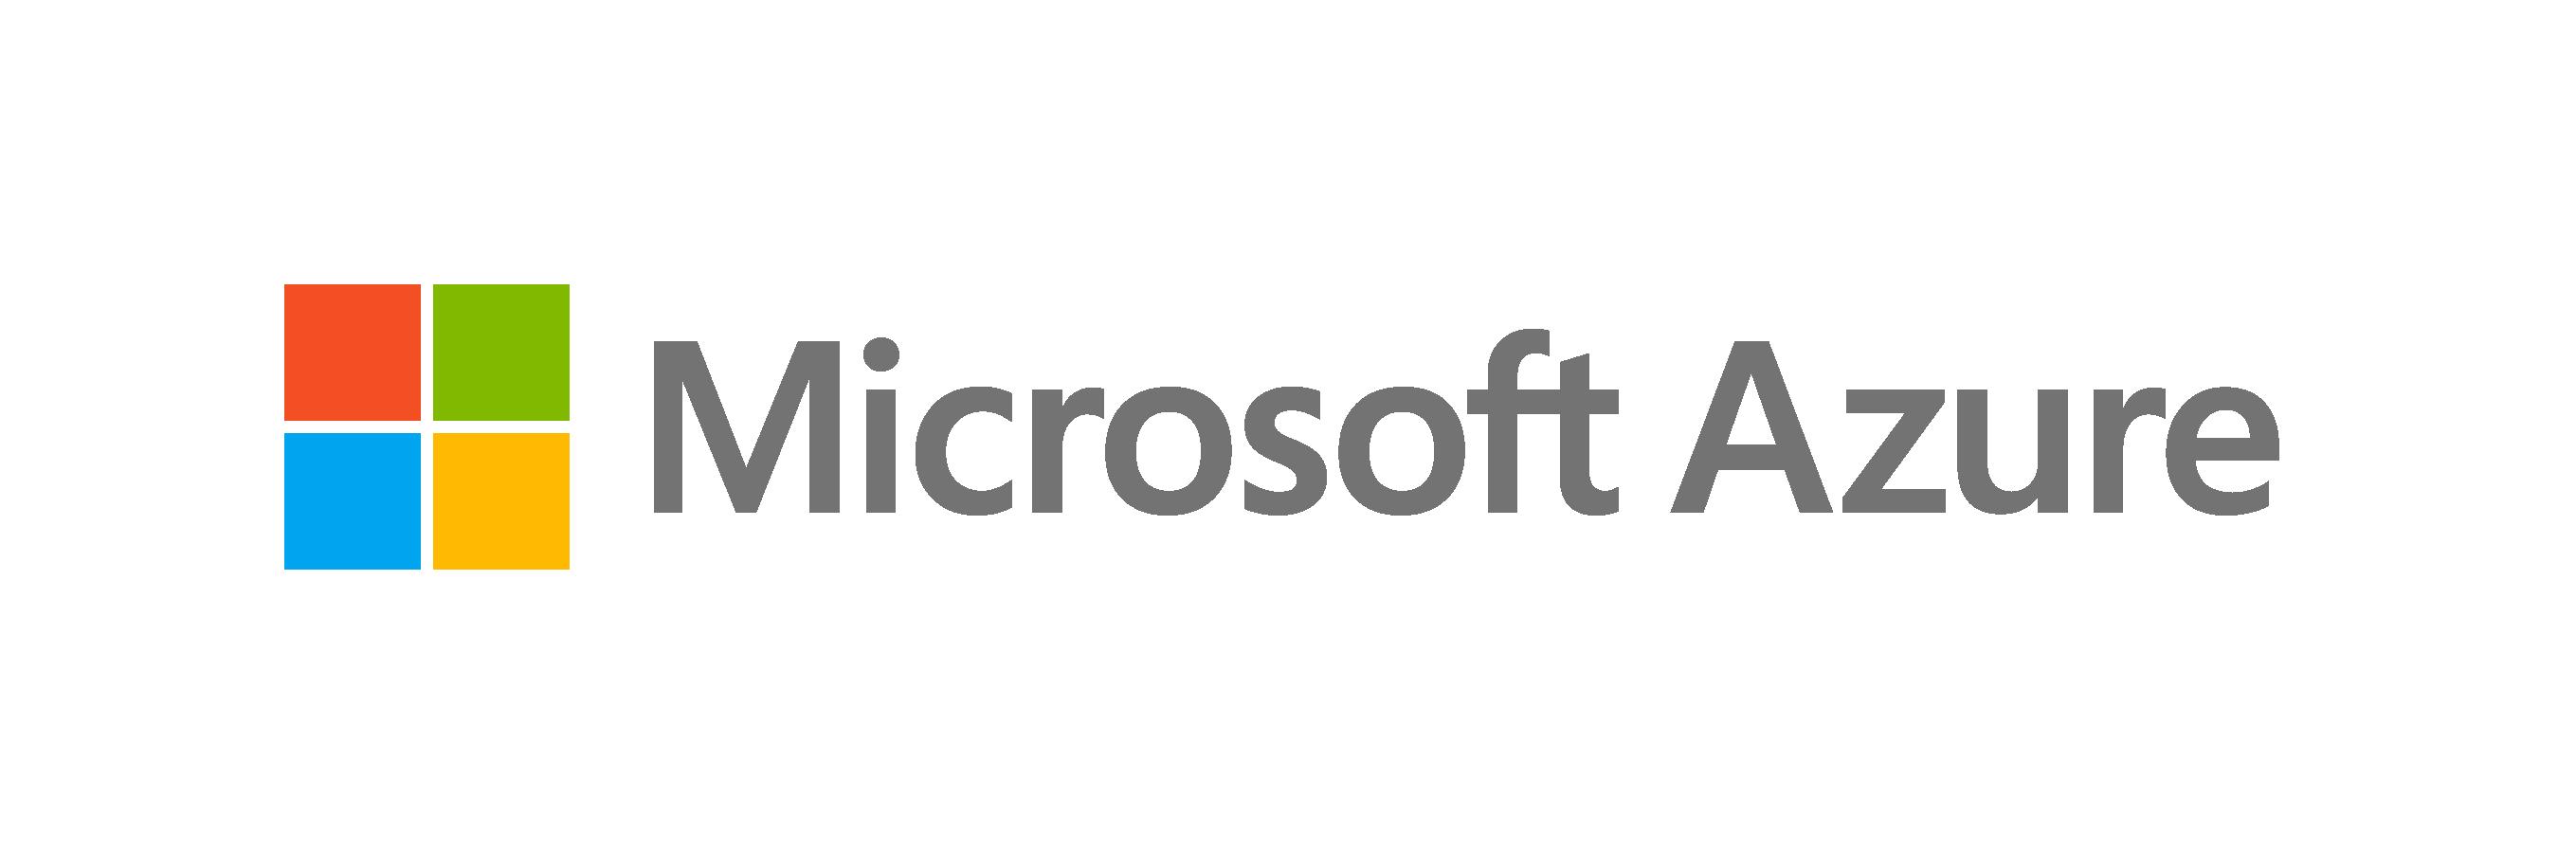 MS-Azure_logo_horiz_c-gray_rgb